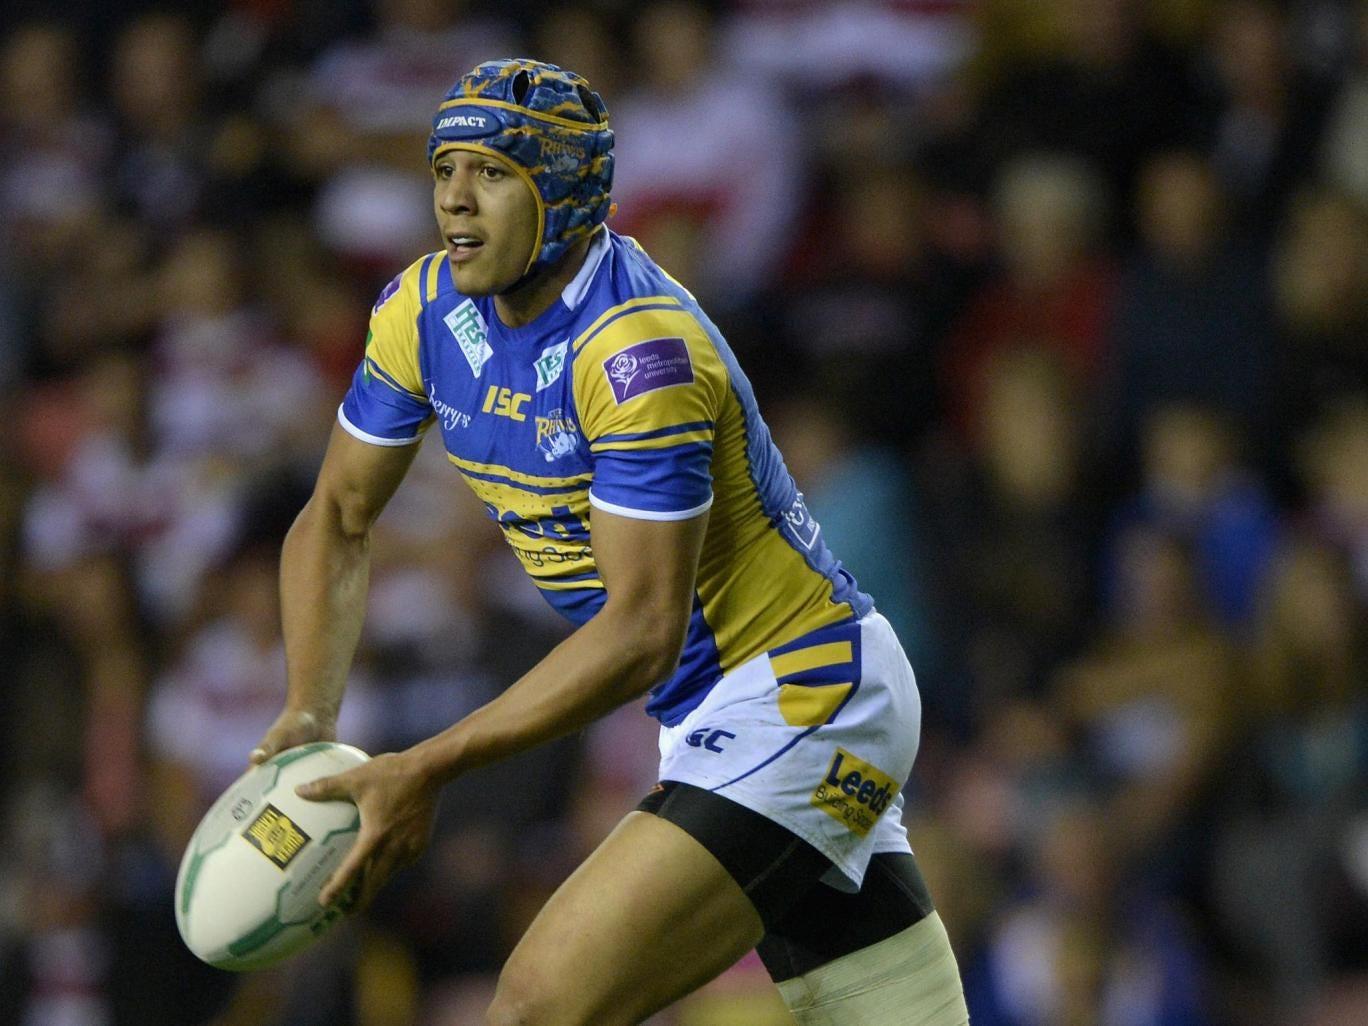 Utility back Ben Jones-Bishop is leaving Leeds for Salford